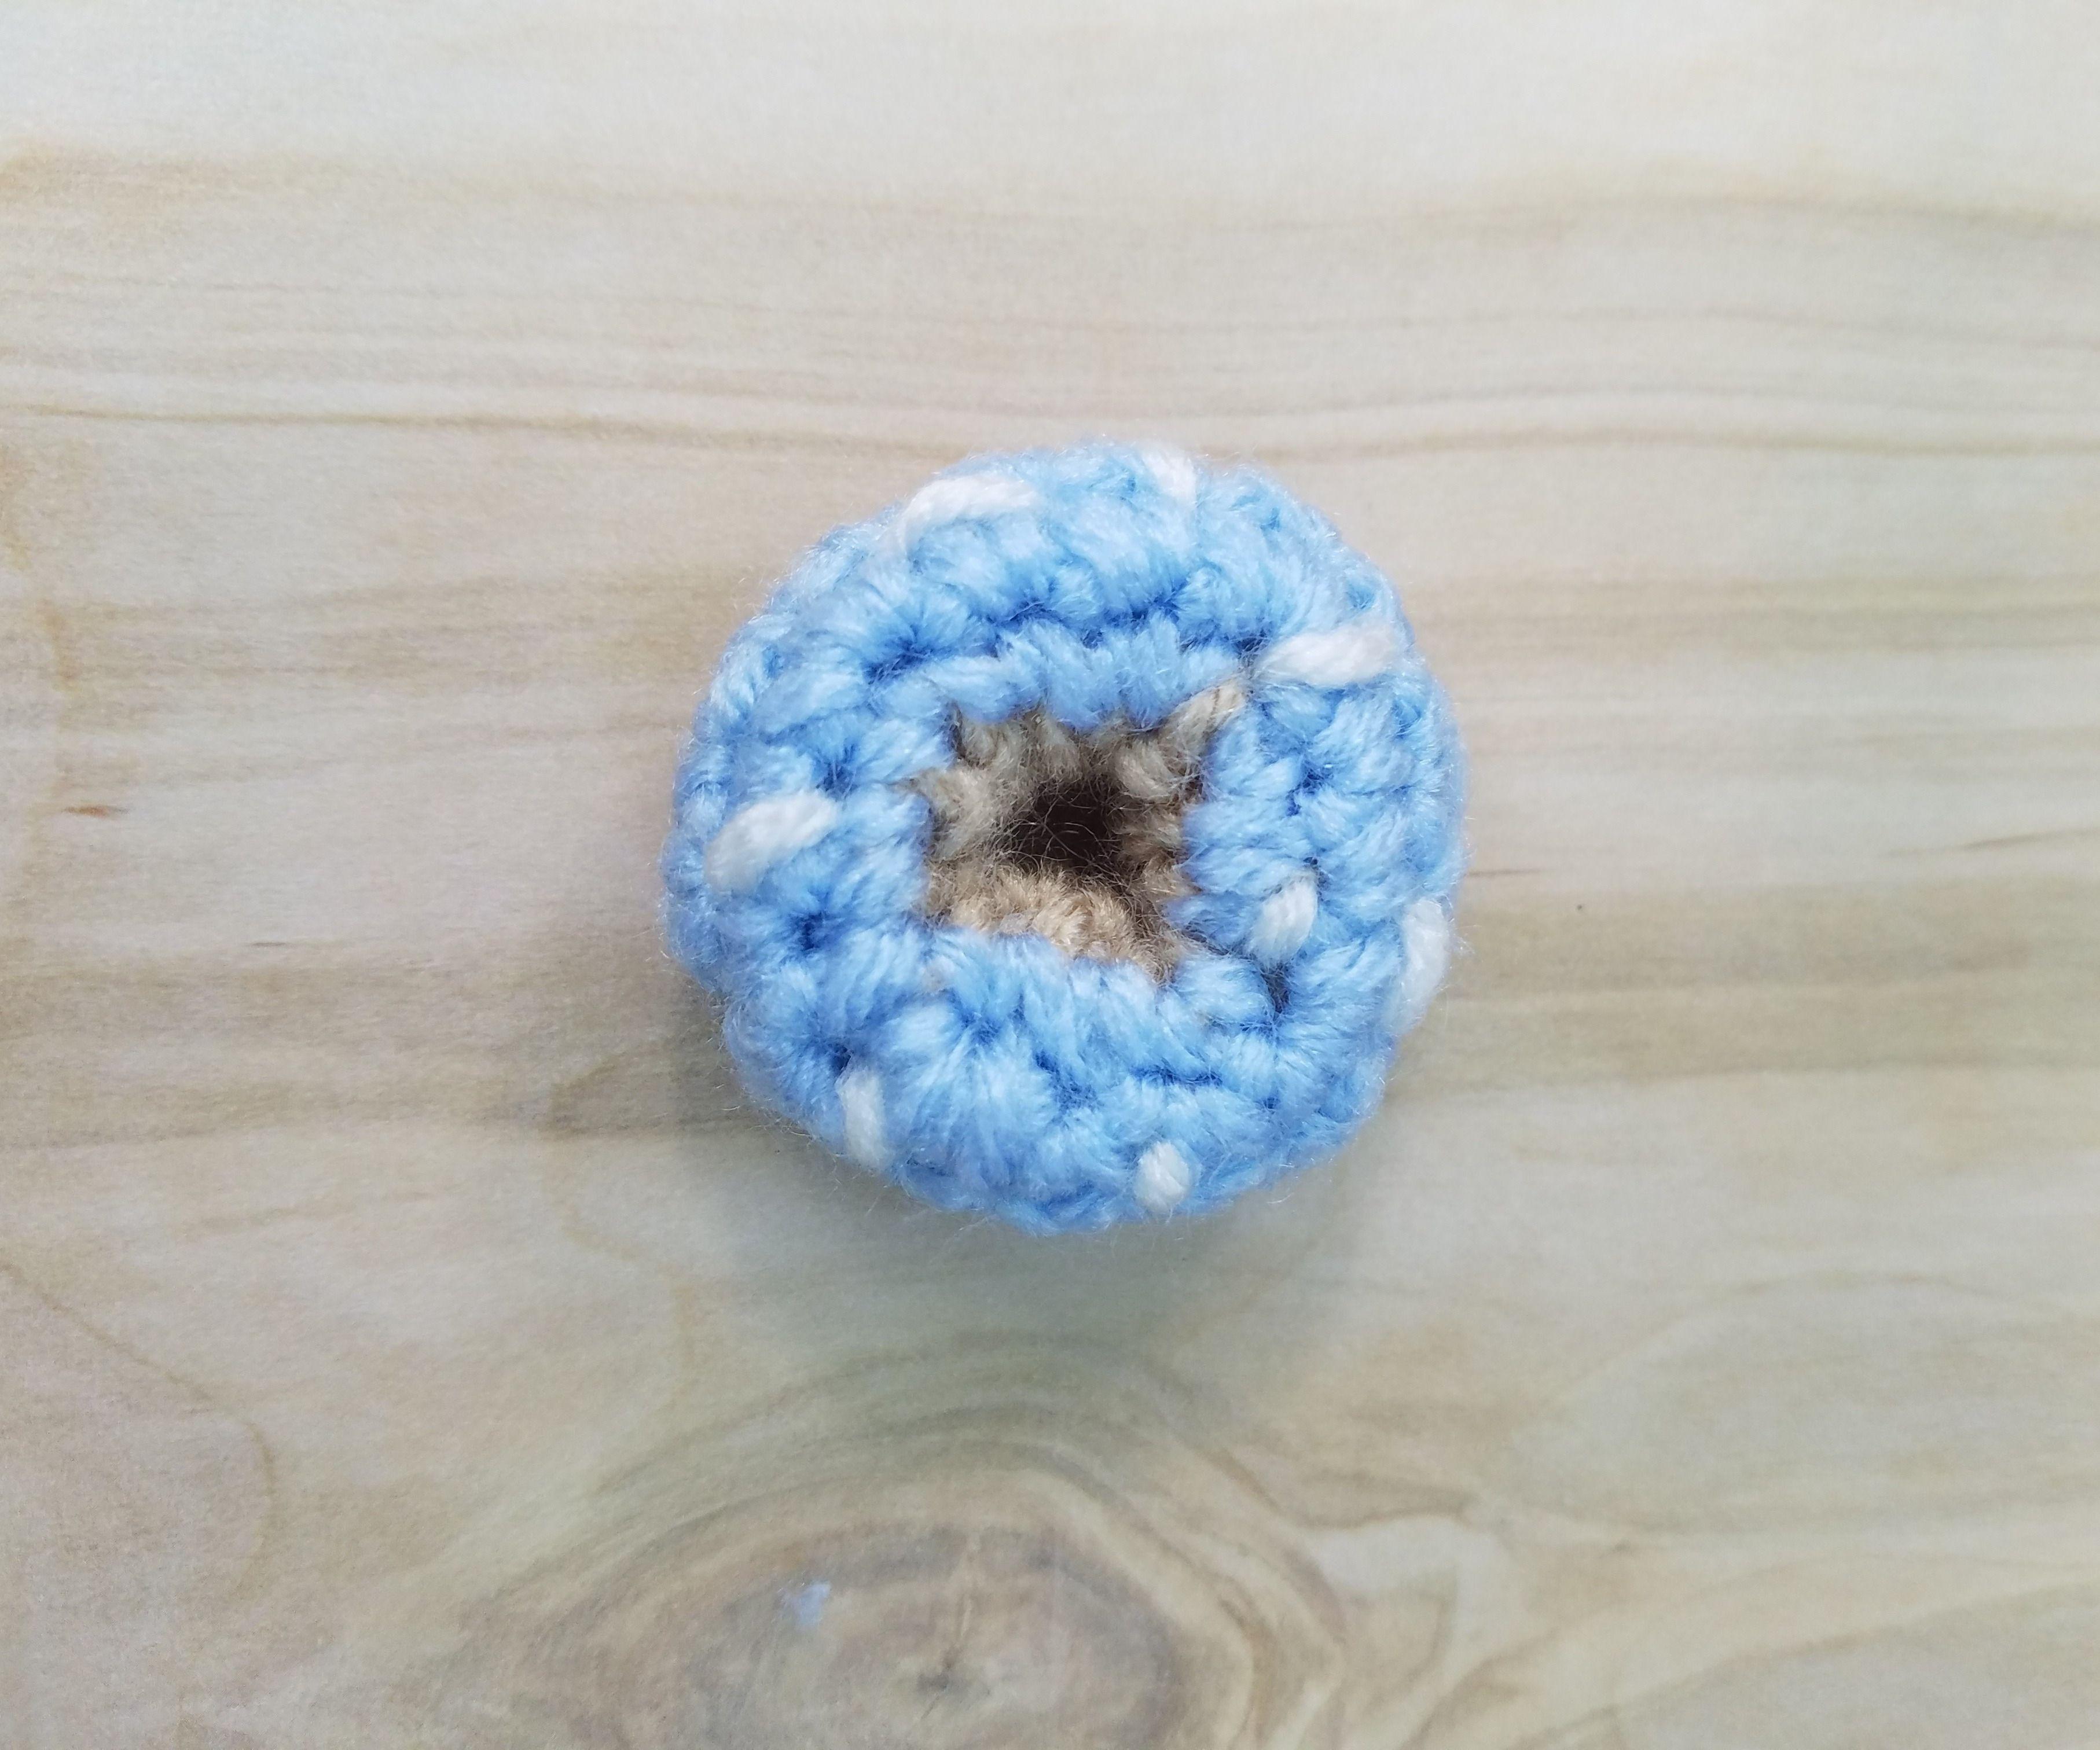 A Tiny Doughnut